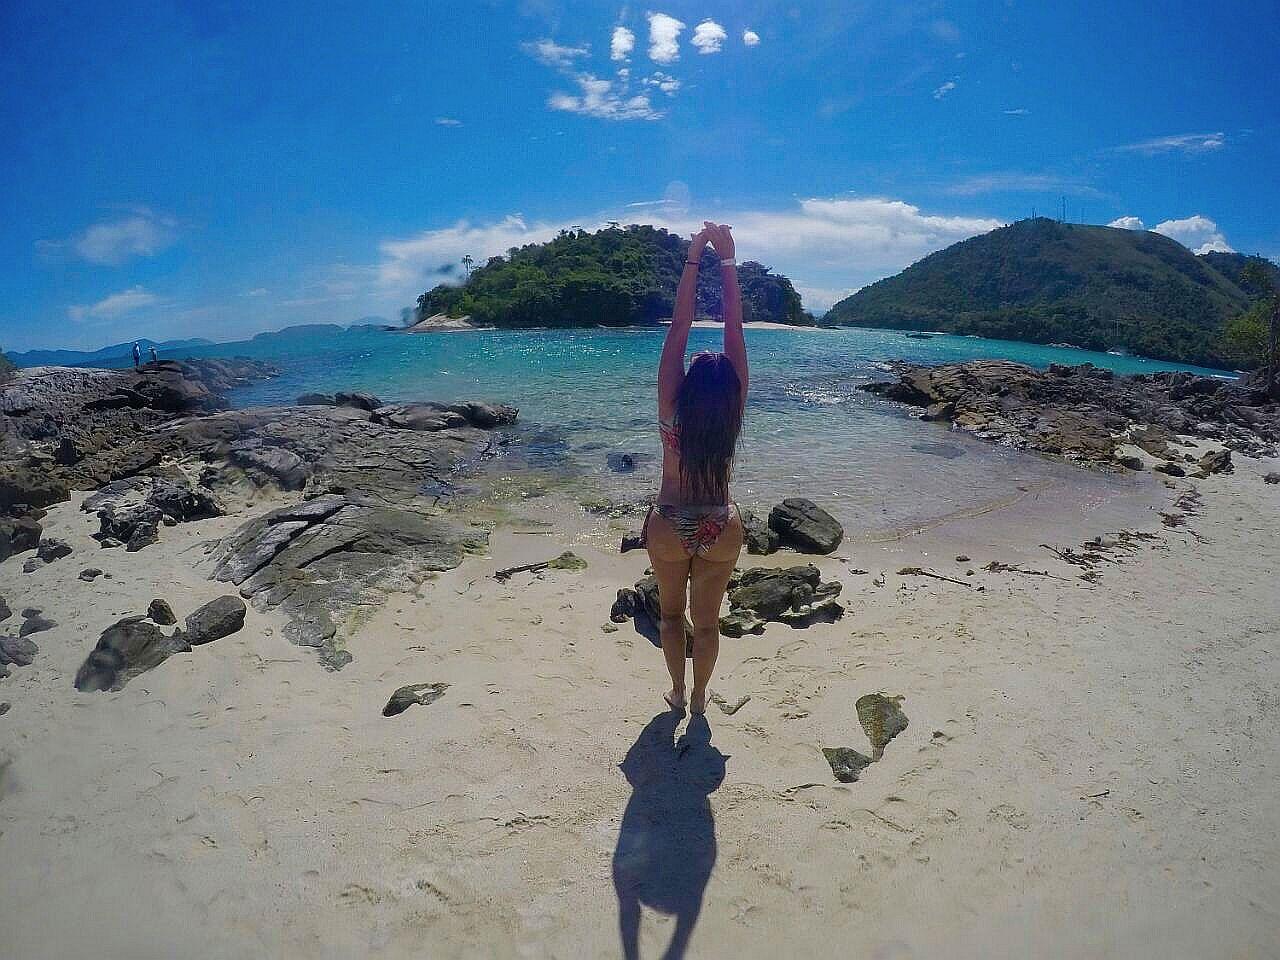 ilha de cataguas parad passeio ilhas paradisíacas